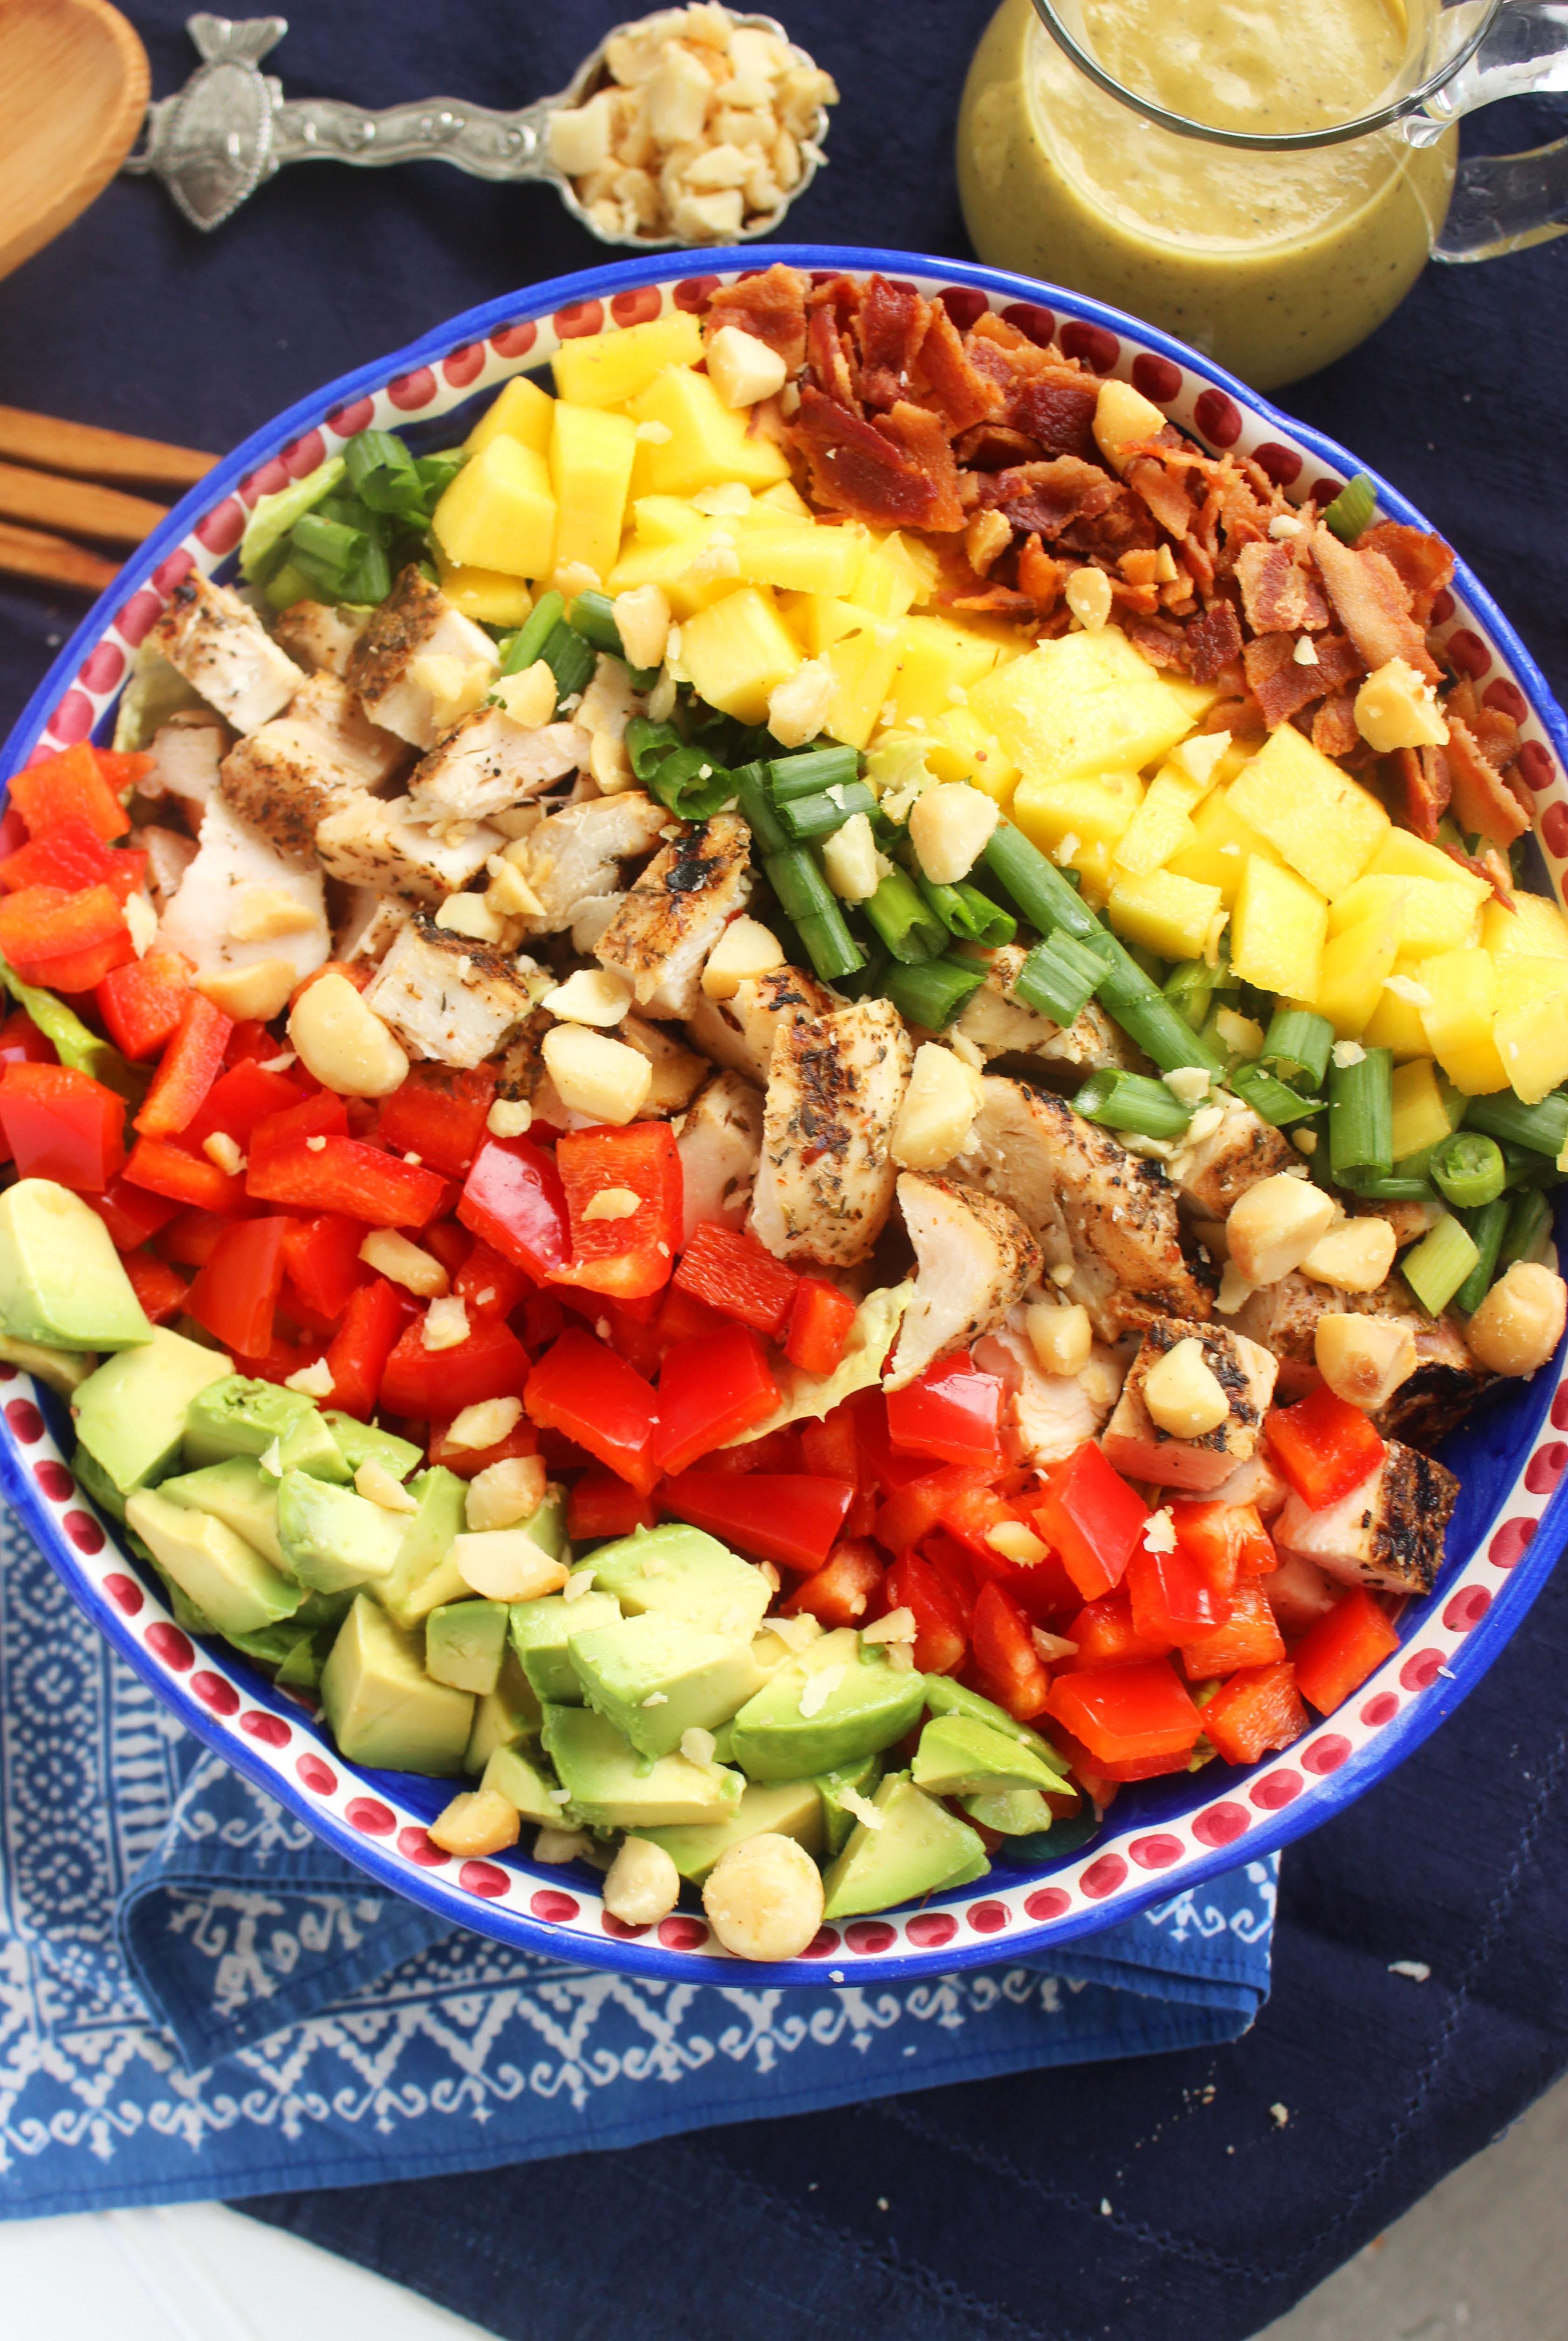 Disney Cruise Line Summer Recipe: Tomato Salad | Disney ...